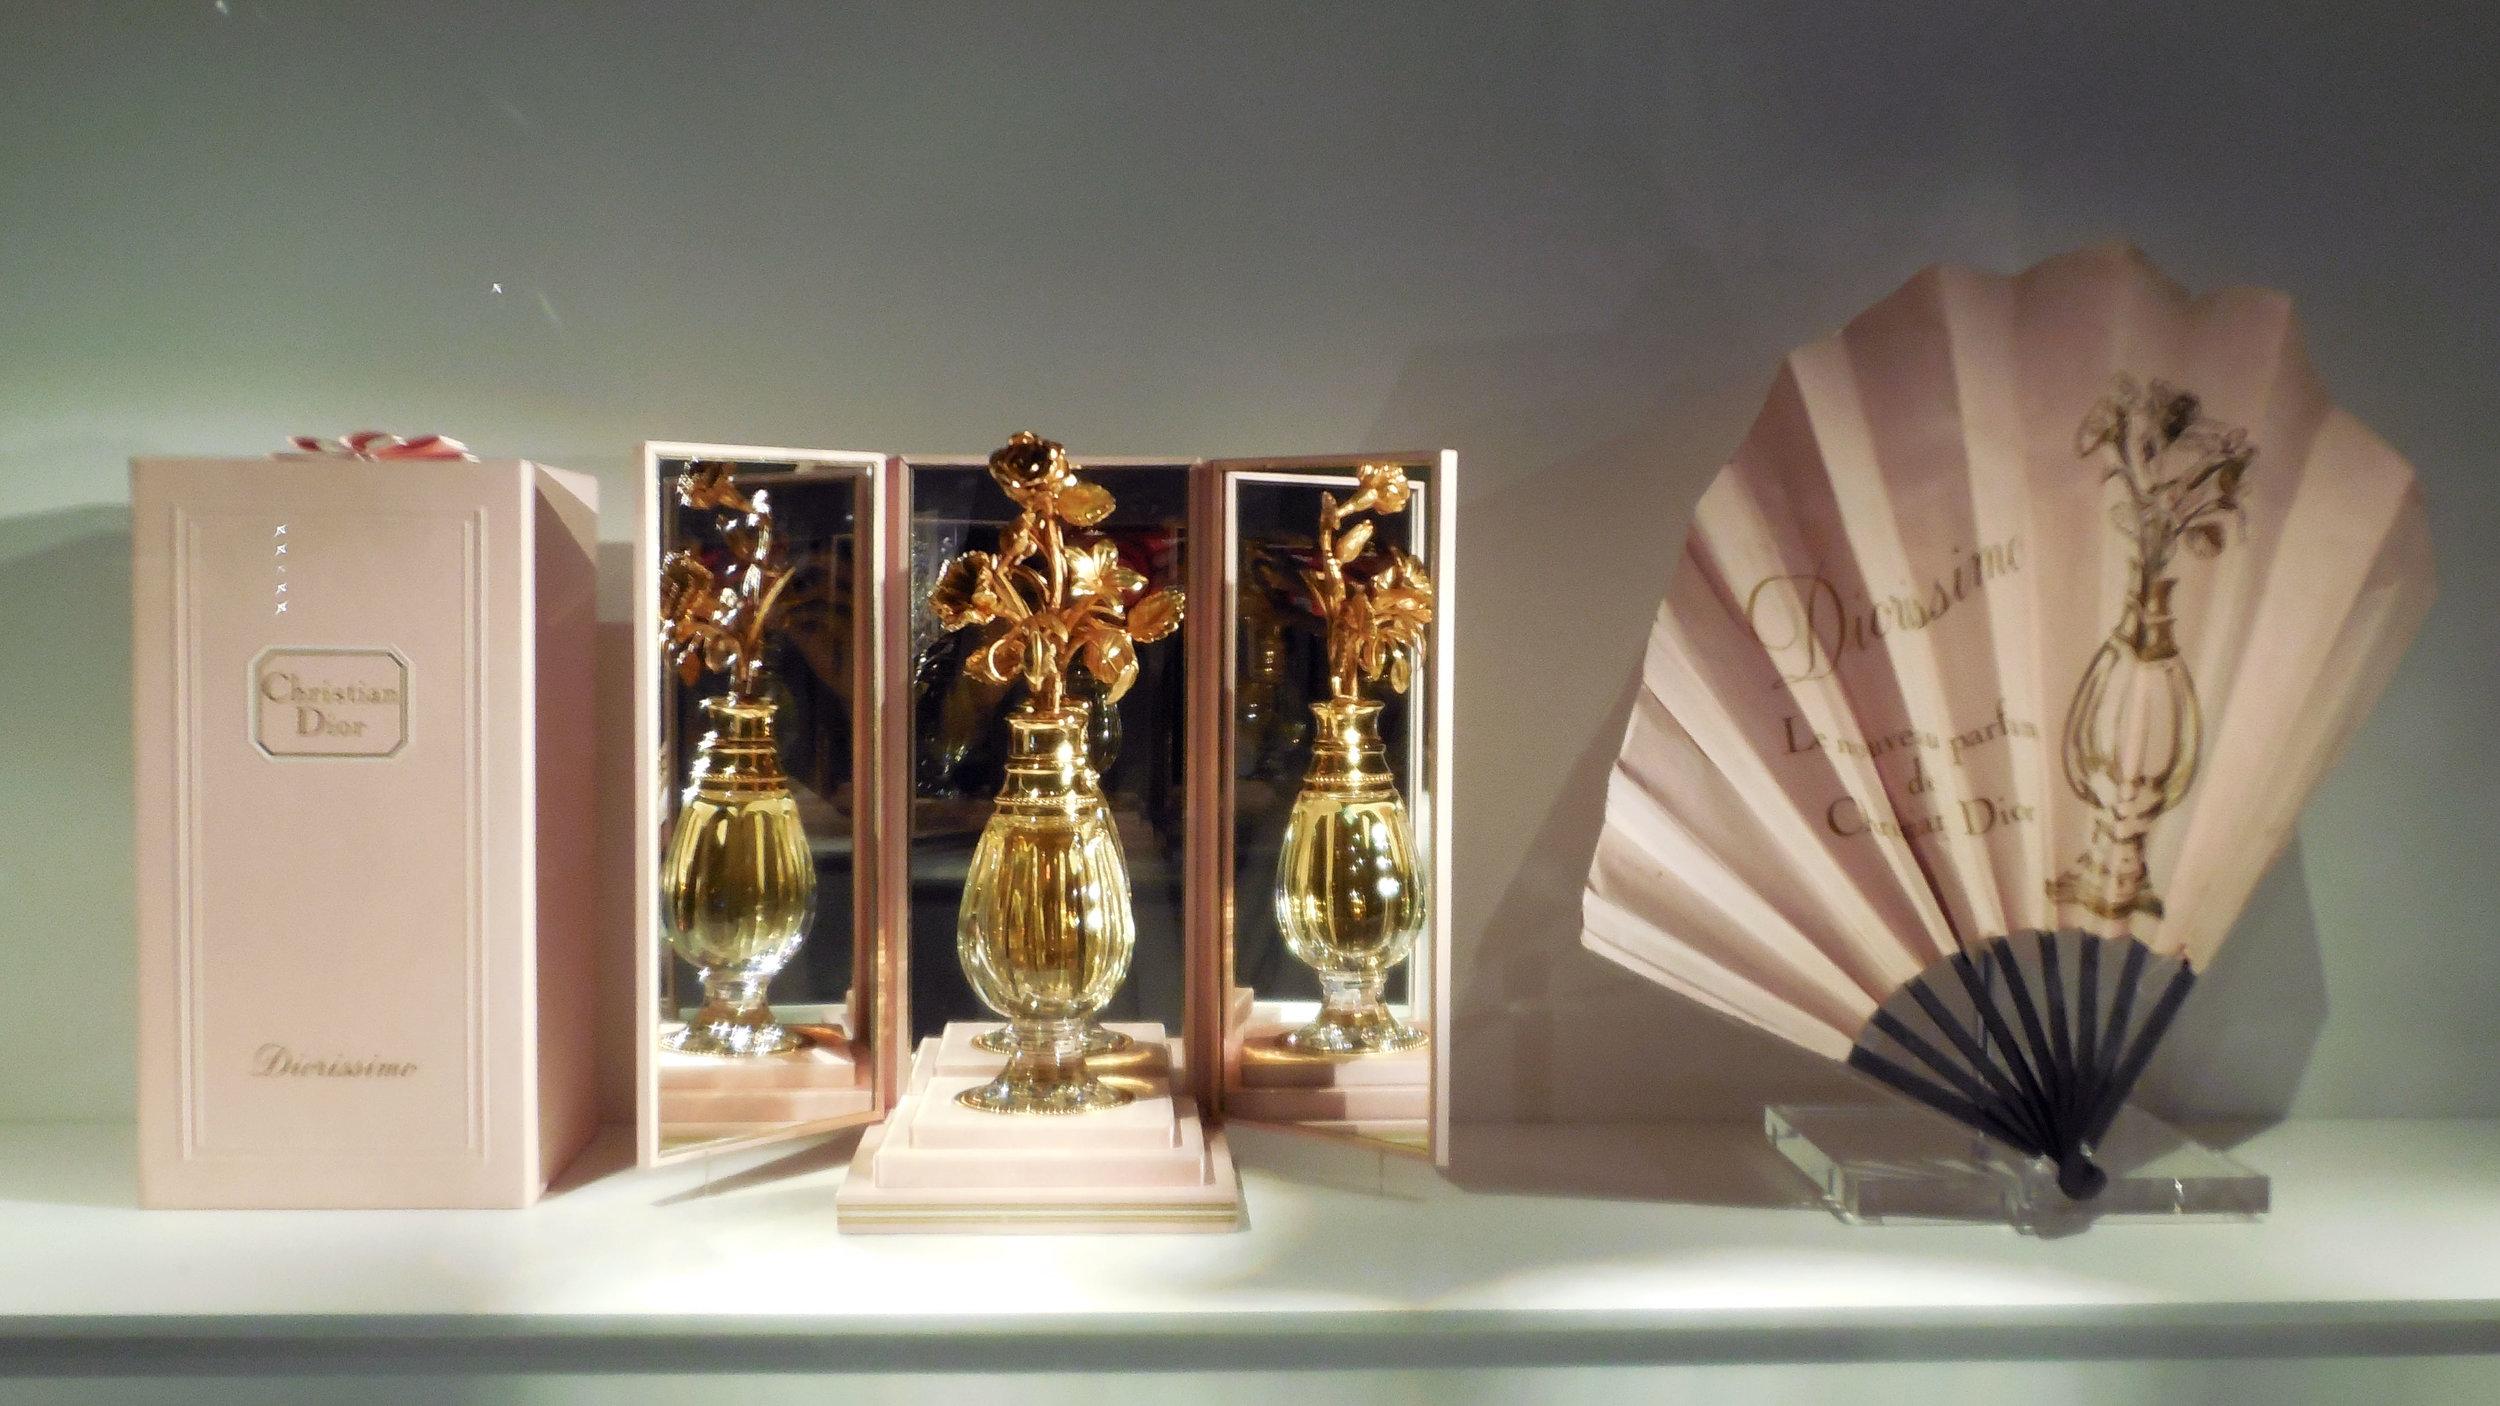 Dior Perfume Bottle and Fan.jpg